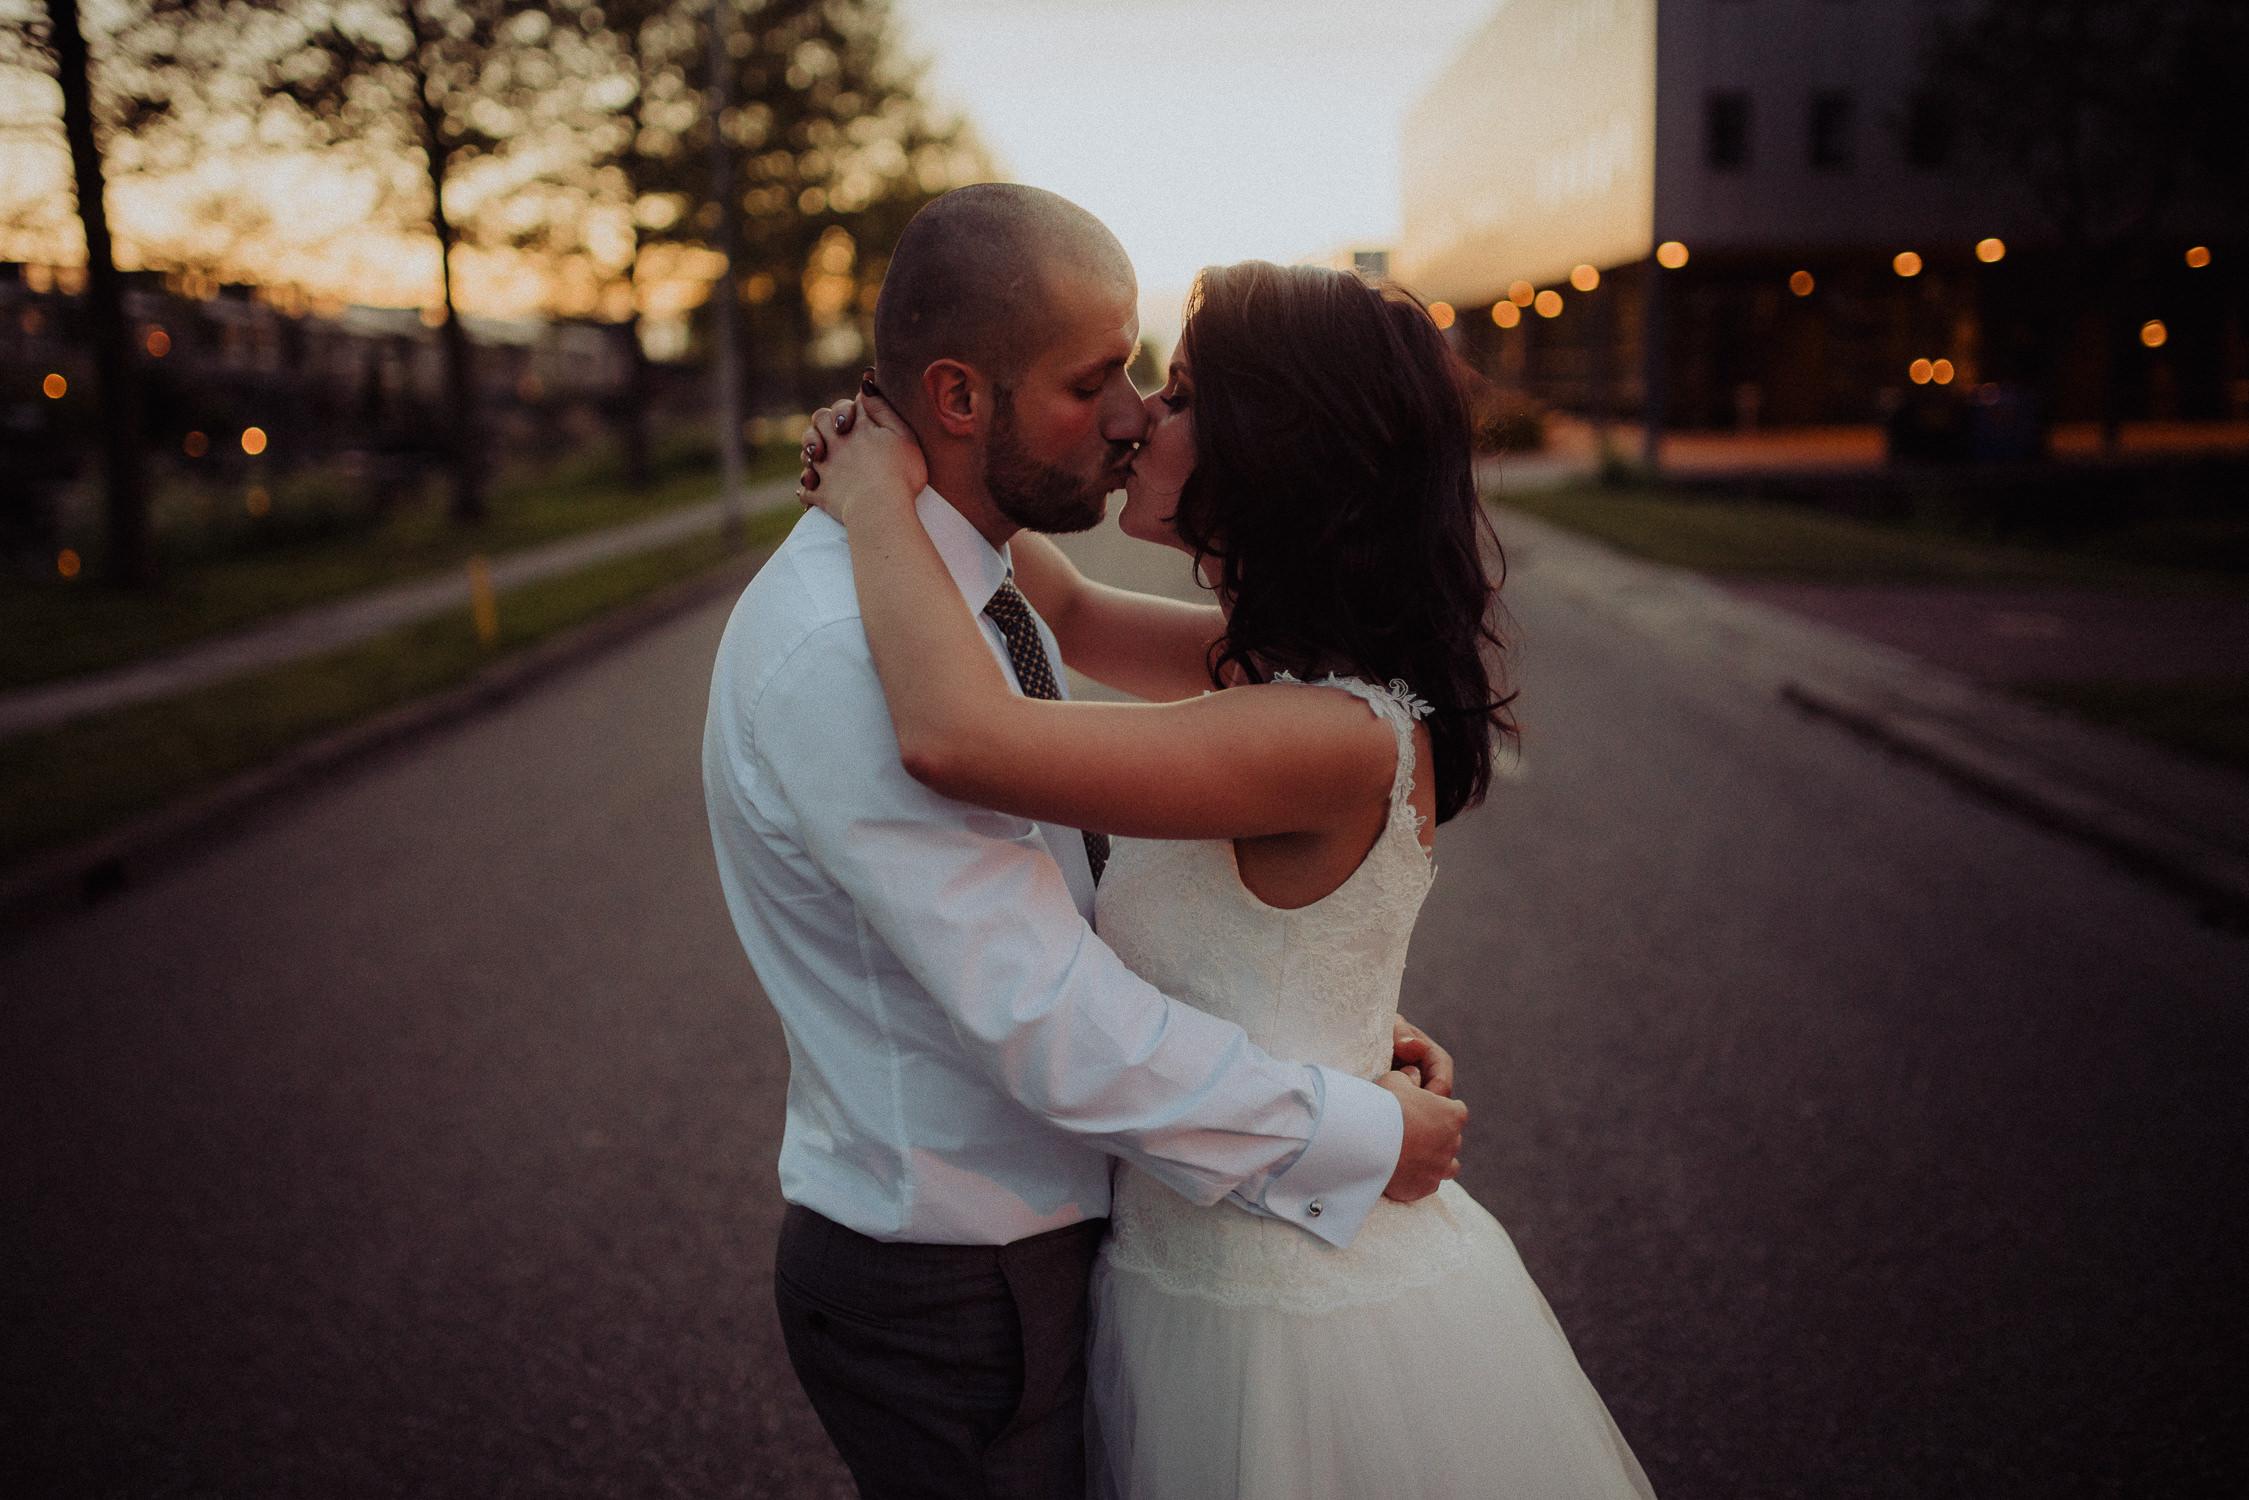 bruidsfotografie-amsterdam-utrecht-trouwfotograaf-mark-hadden-wedding-photography-dado-dalila-503.jpg